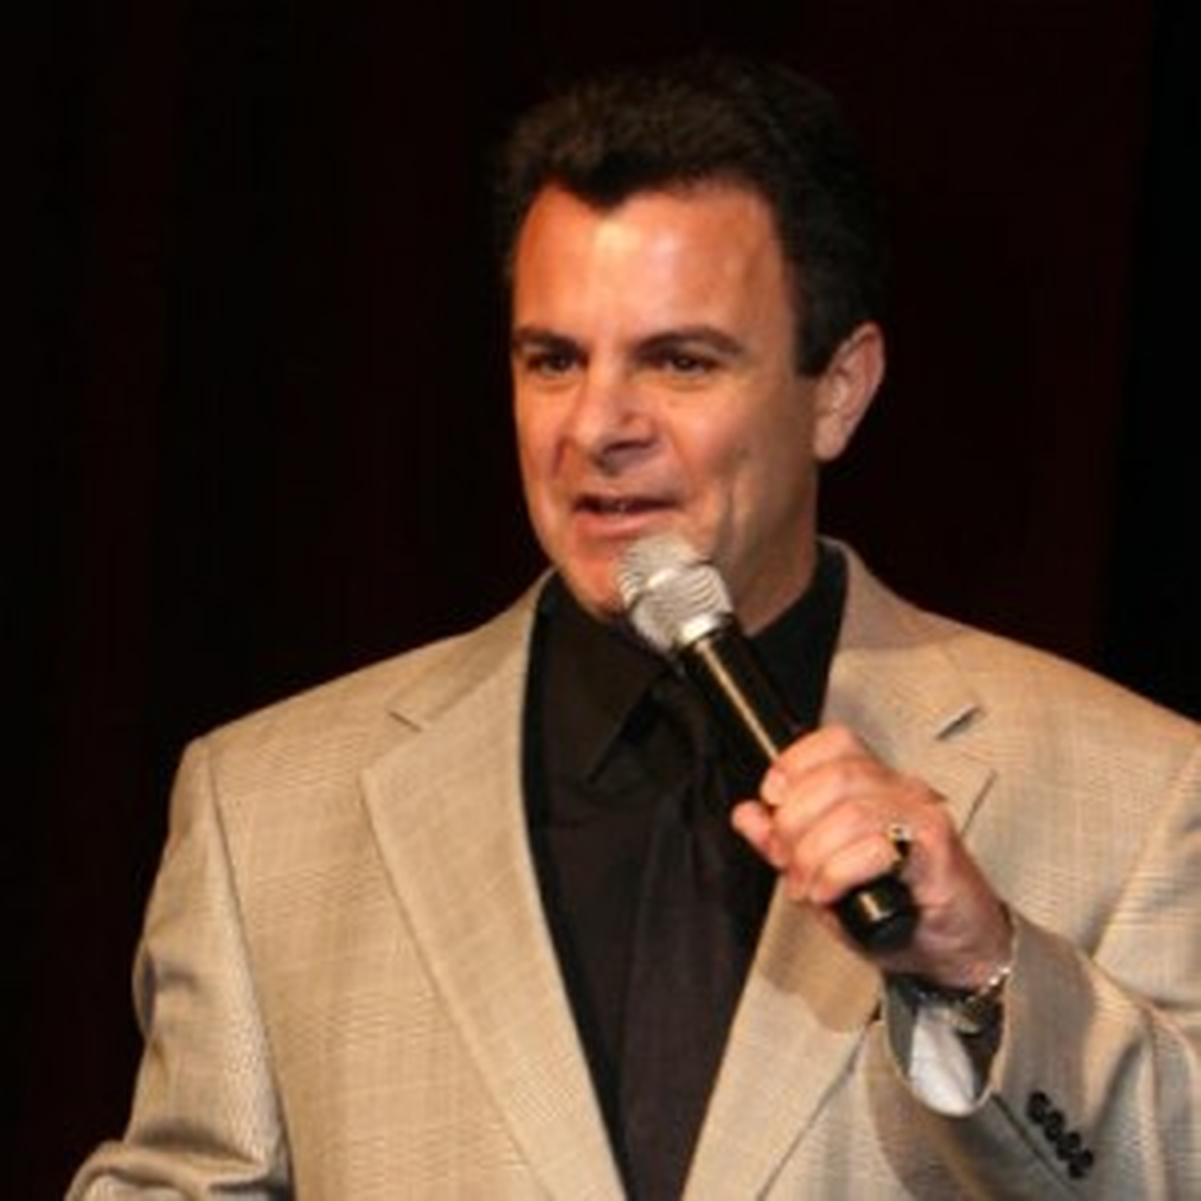 Doug Ferony Show